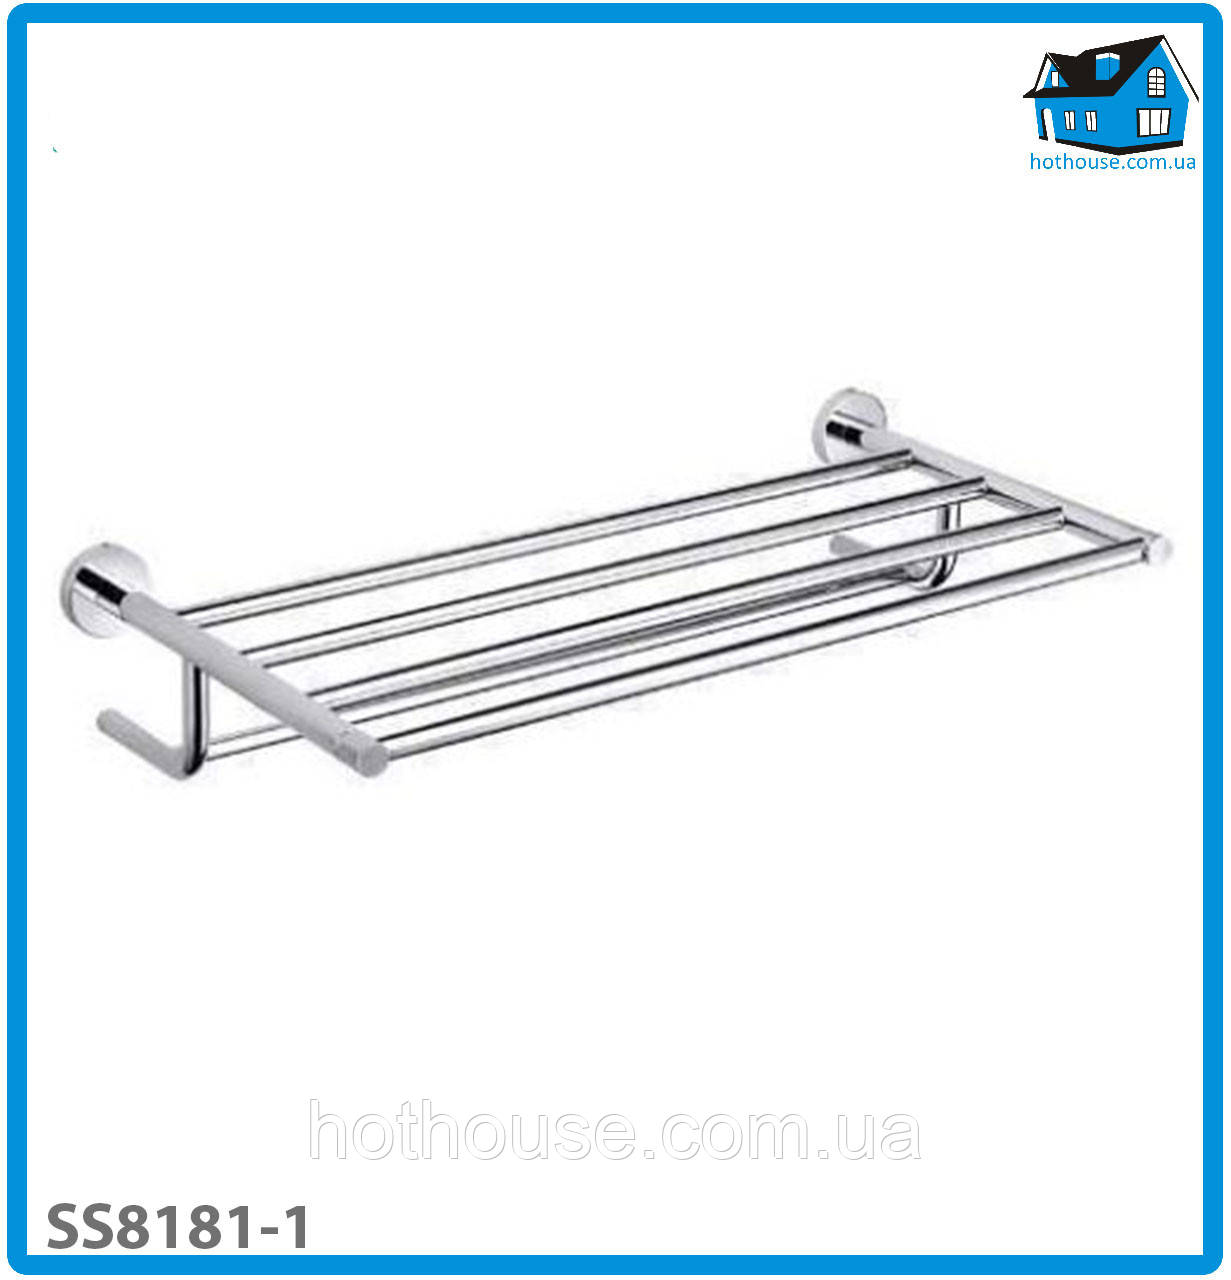 Полочка для ванны Perfect Sanytary Appliances SP 8181-1